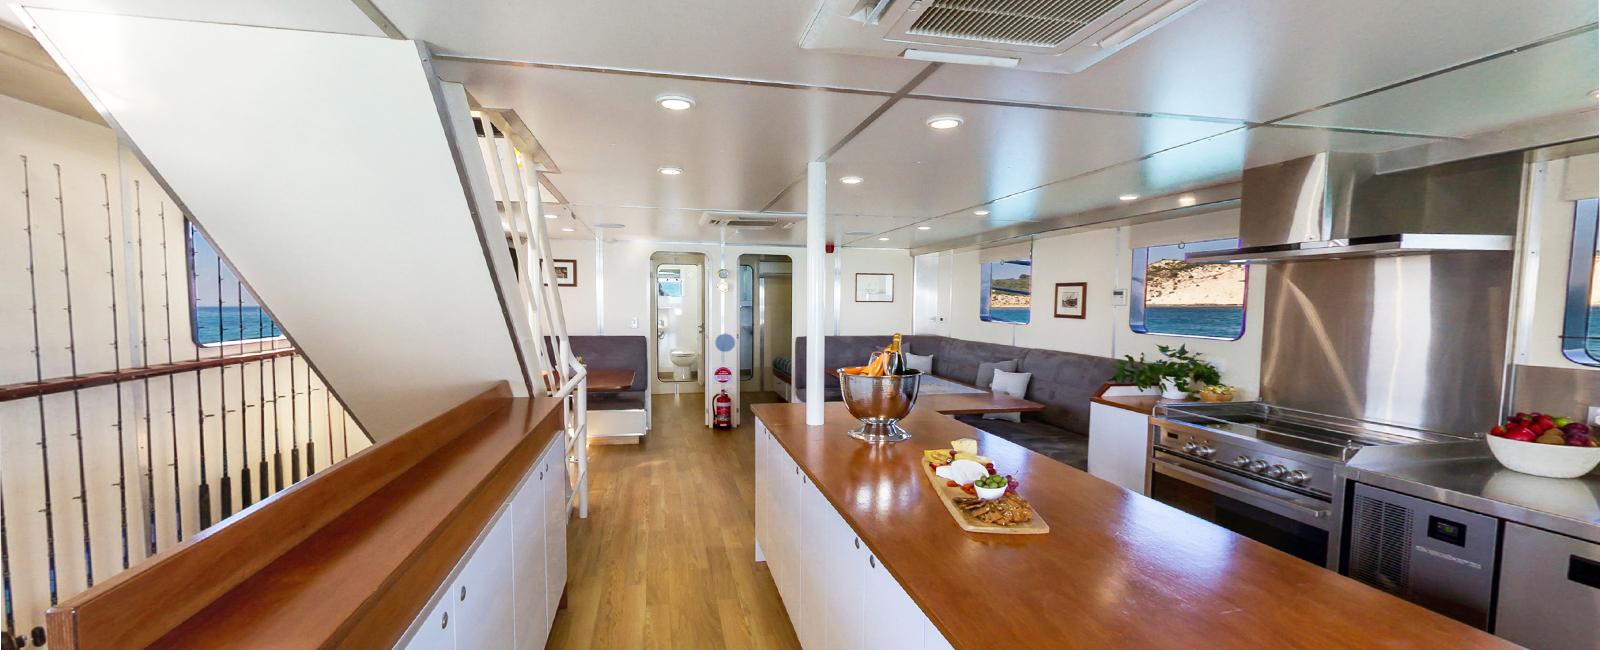 KIMBERLEY-PEARL-interior-kitchen-galley